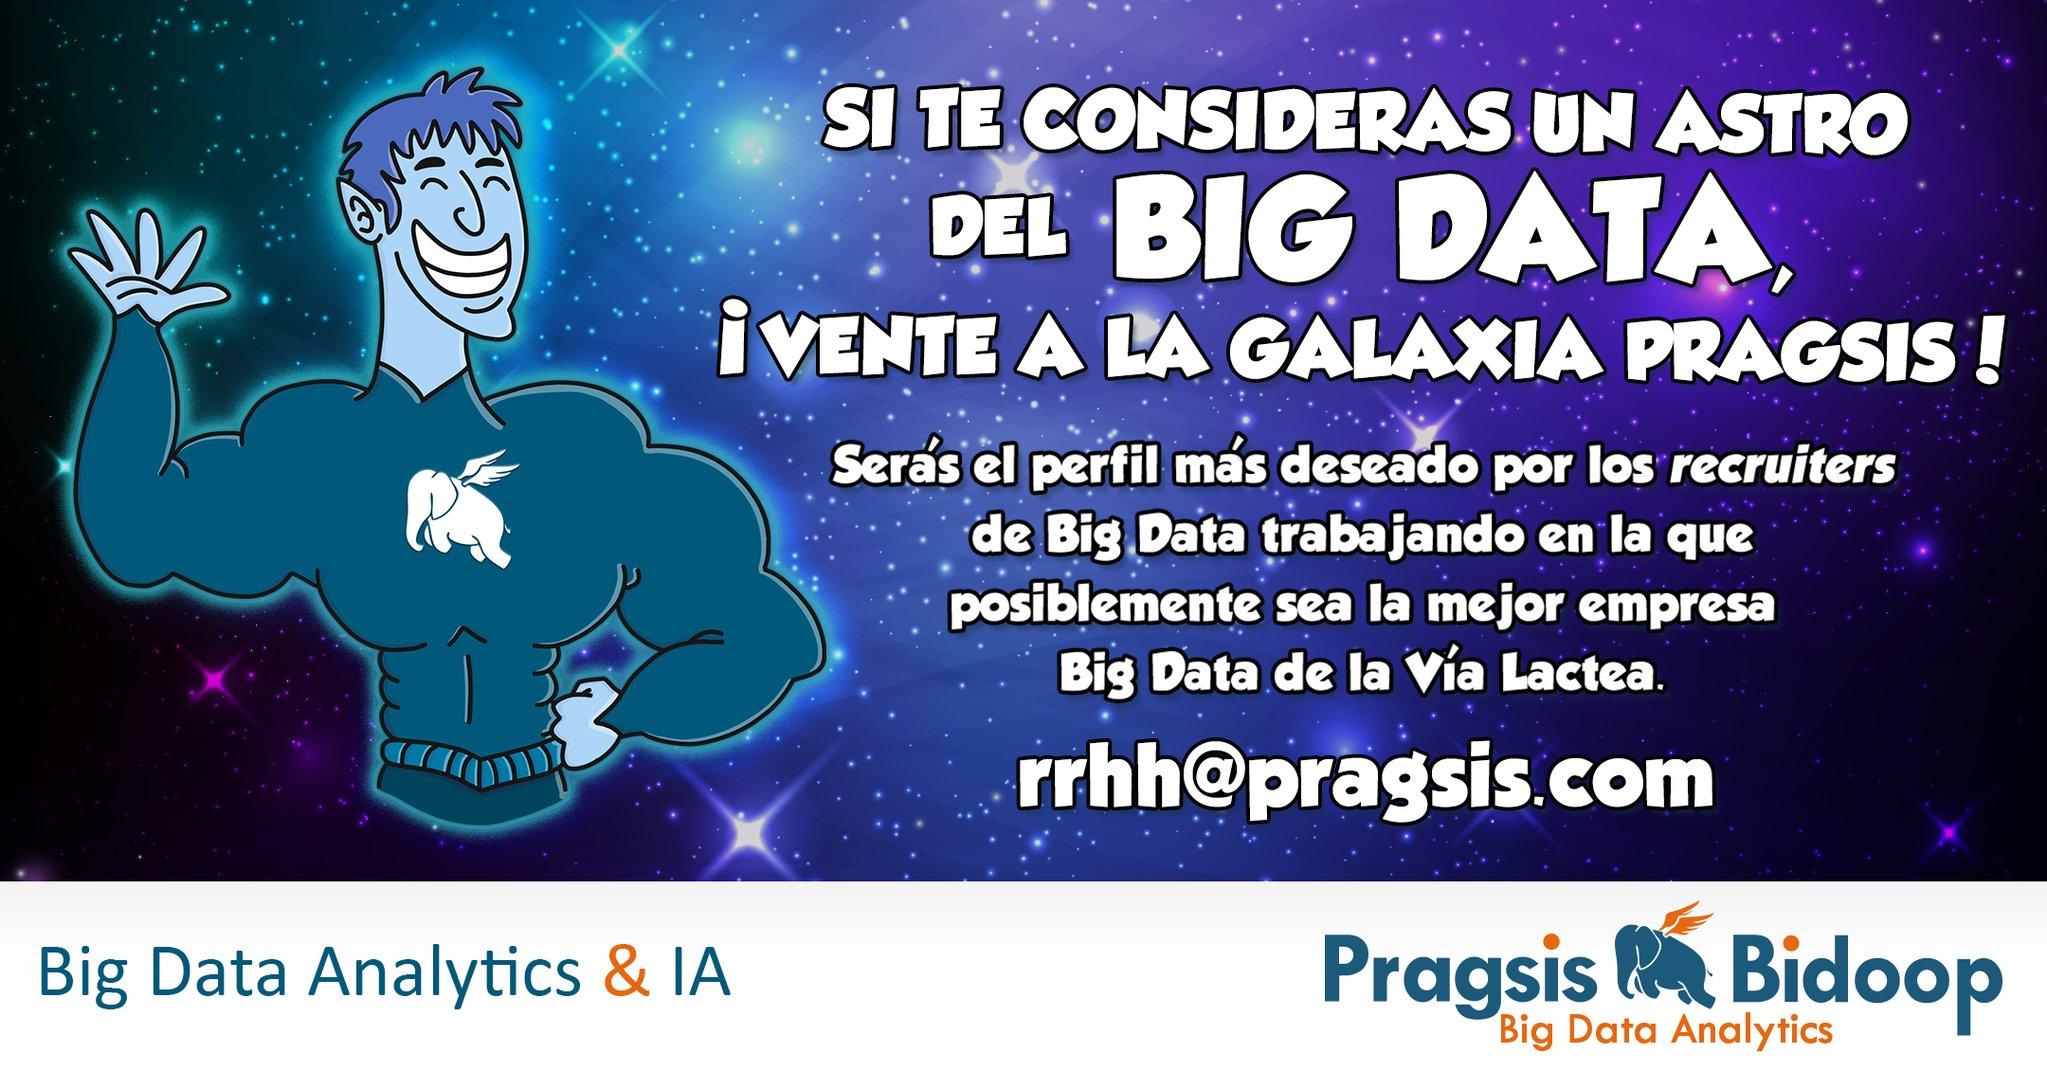 Galaxia Pragsis